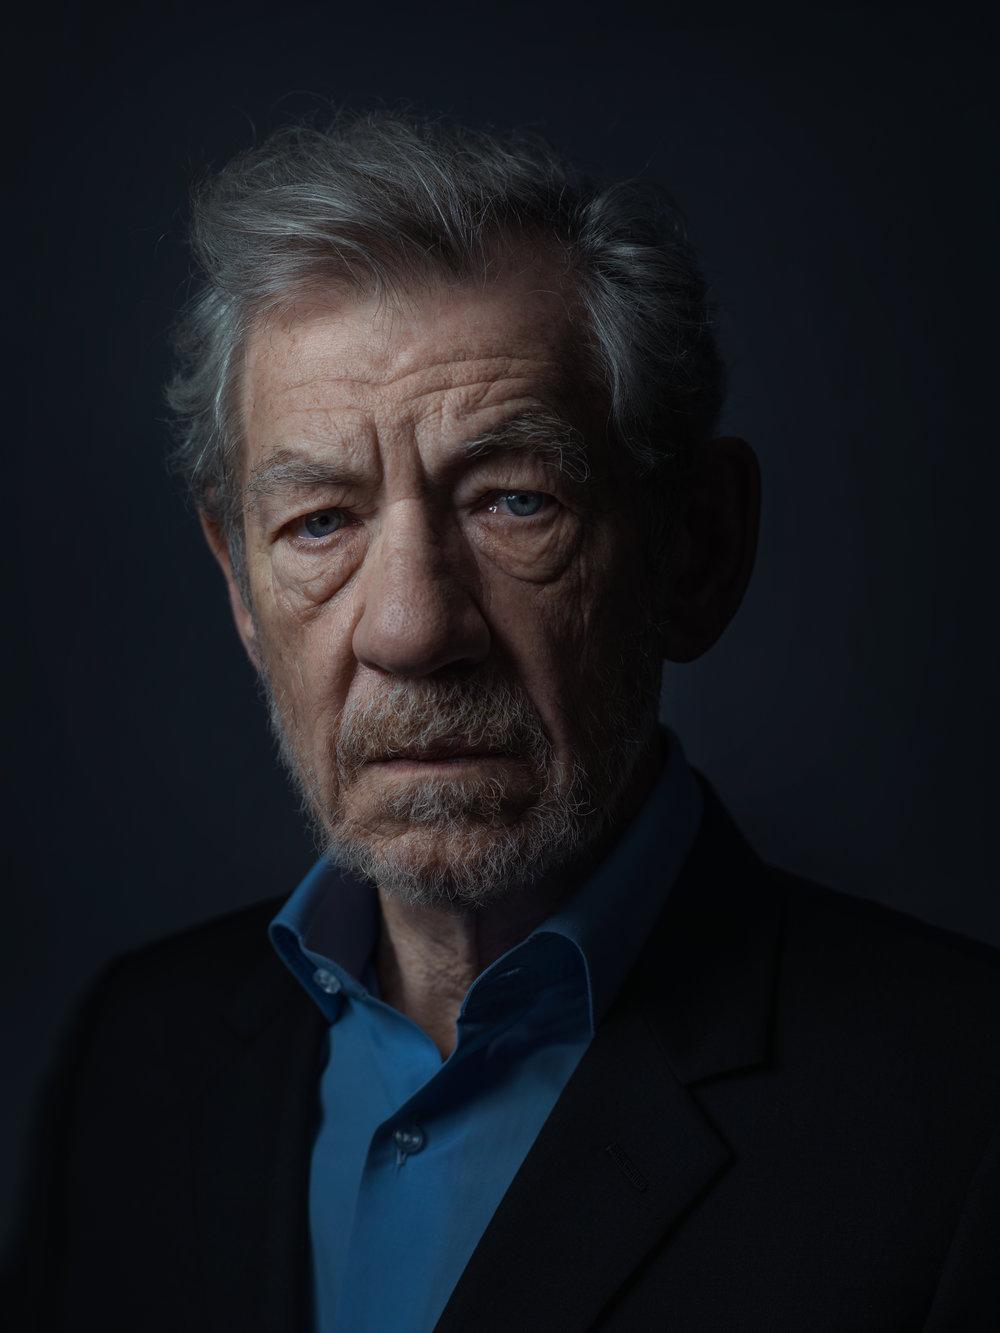 Sir Ian McKellen by Rory Lewis